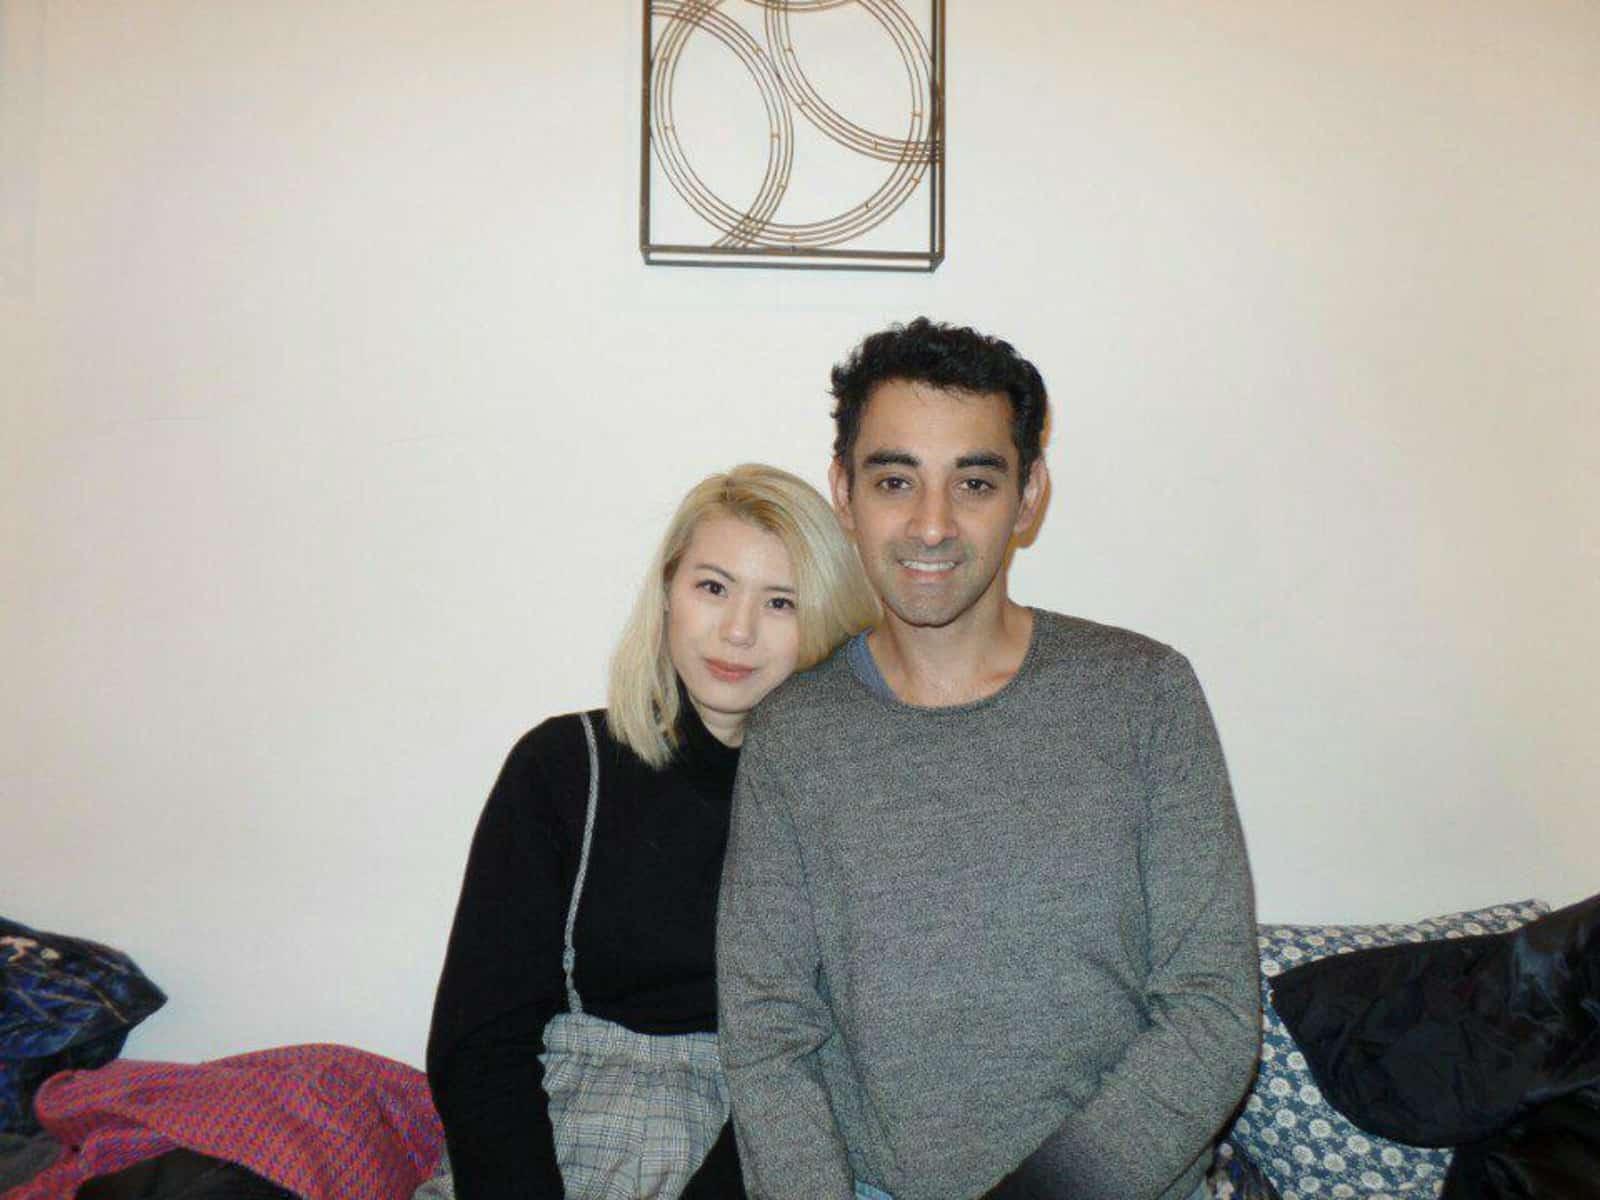 Nicolas & Rachel from Melbourne, Victoria, Australia